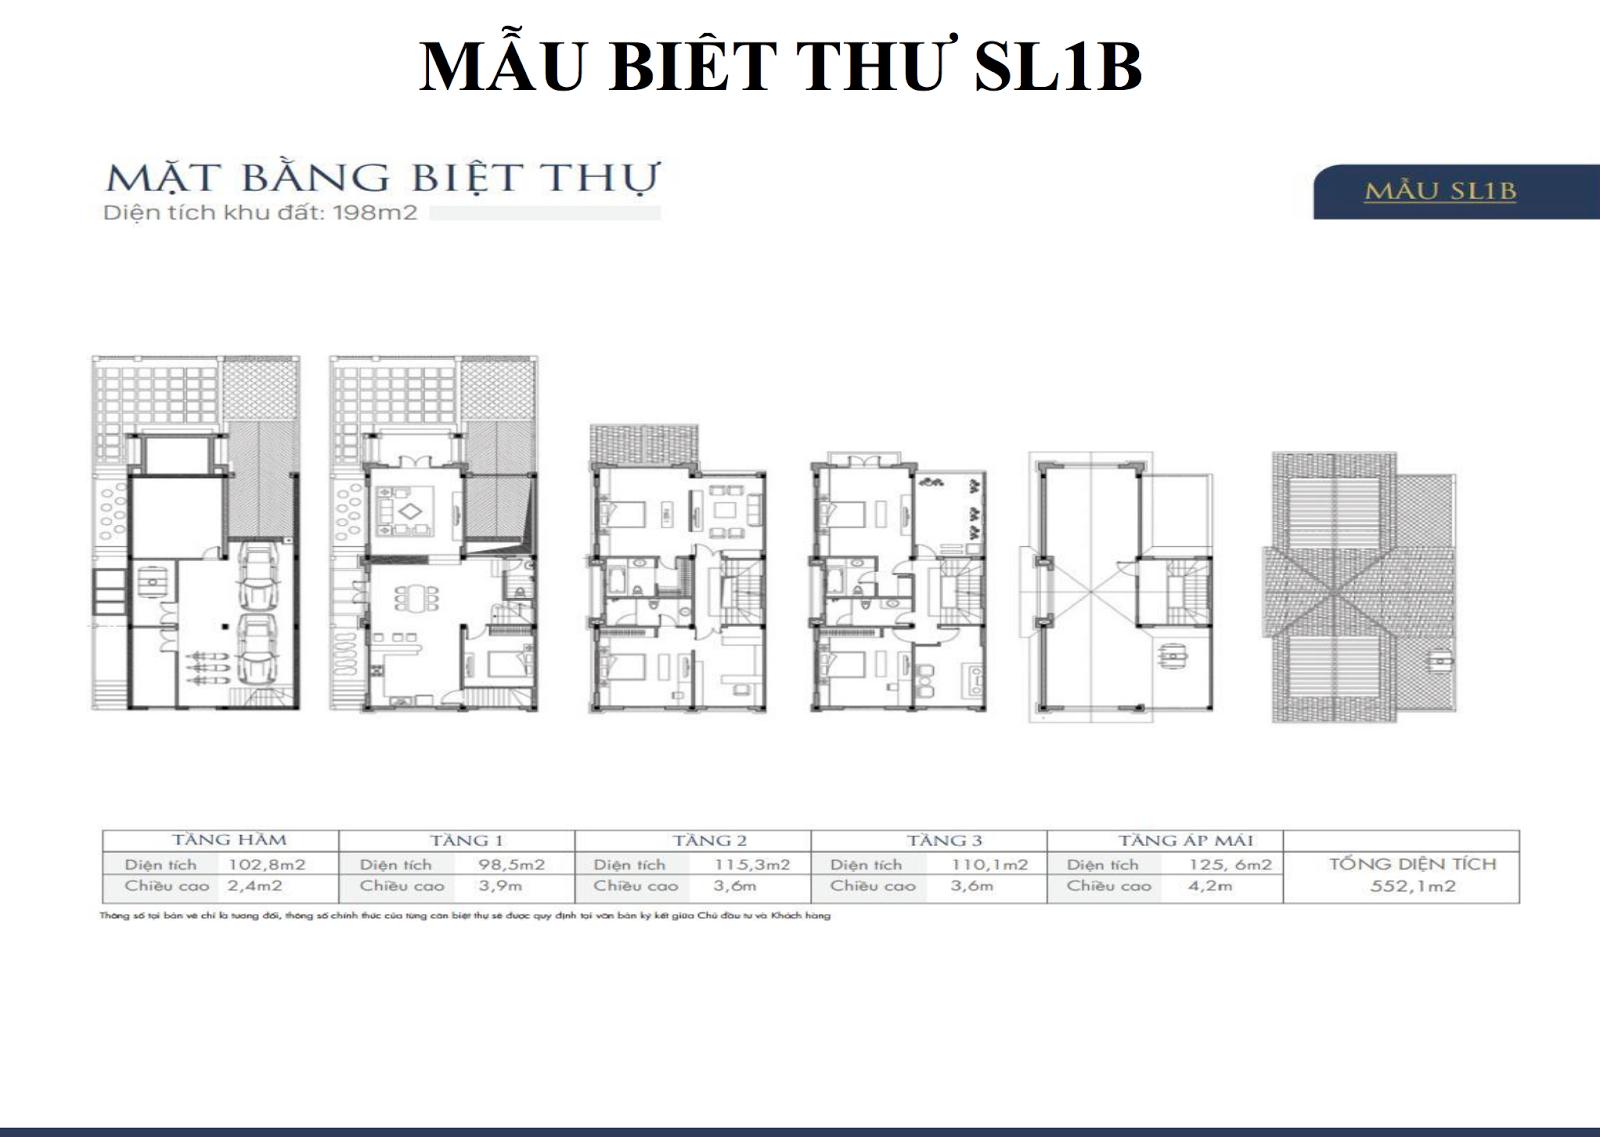 Mặt bằng biệt thự An Khang Villas SL1B